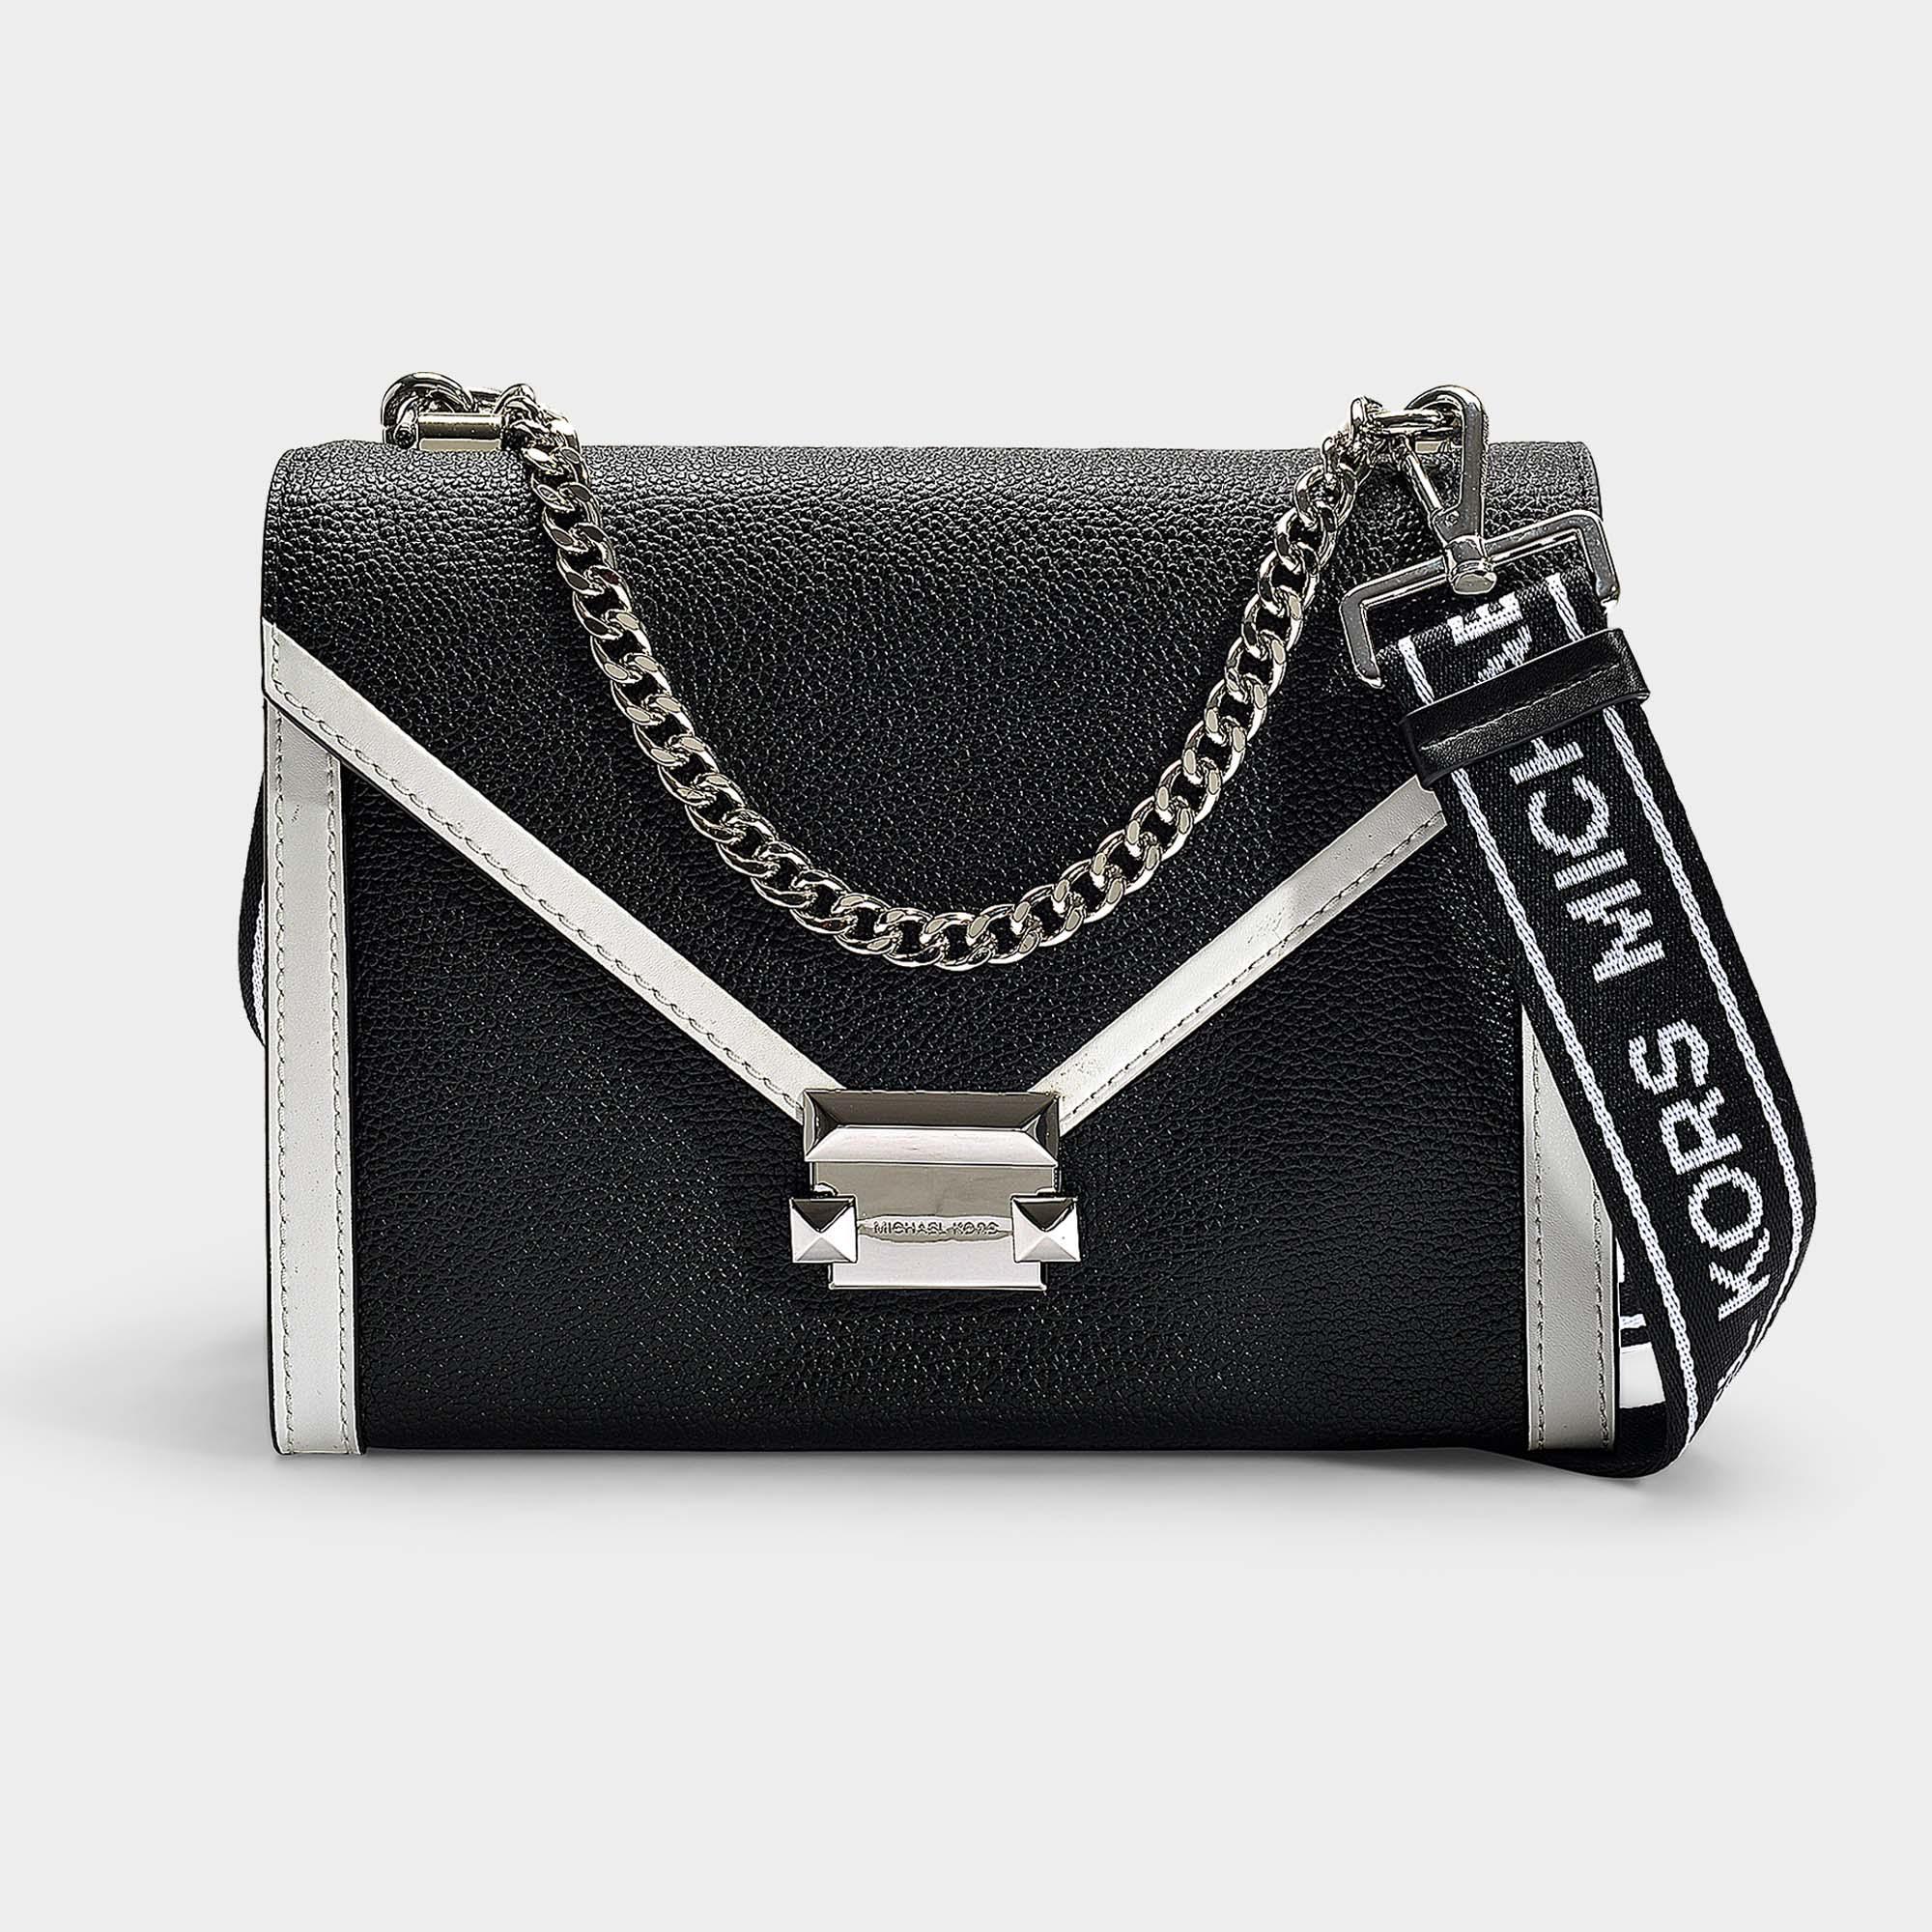 d6dffe48dae0 MICHAEL Michael Kors. Women's Whitney Large Shoulder Bag In Black And Optic  White Grained Calfskin